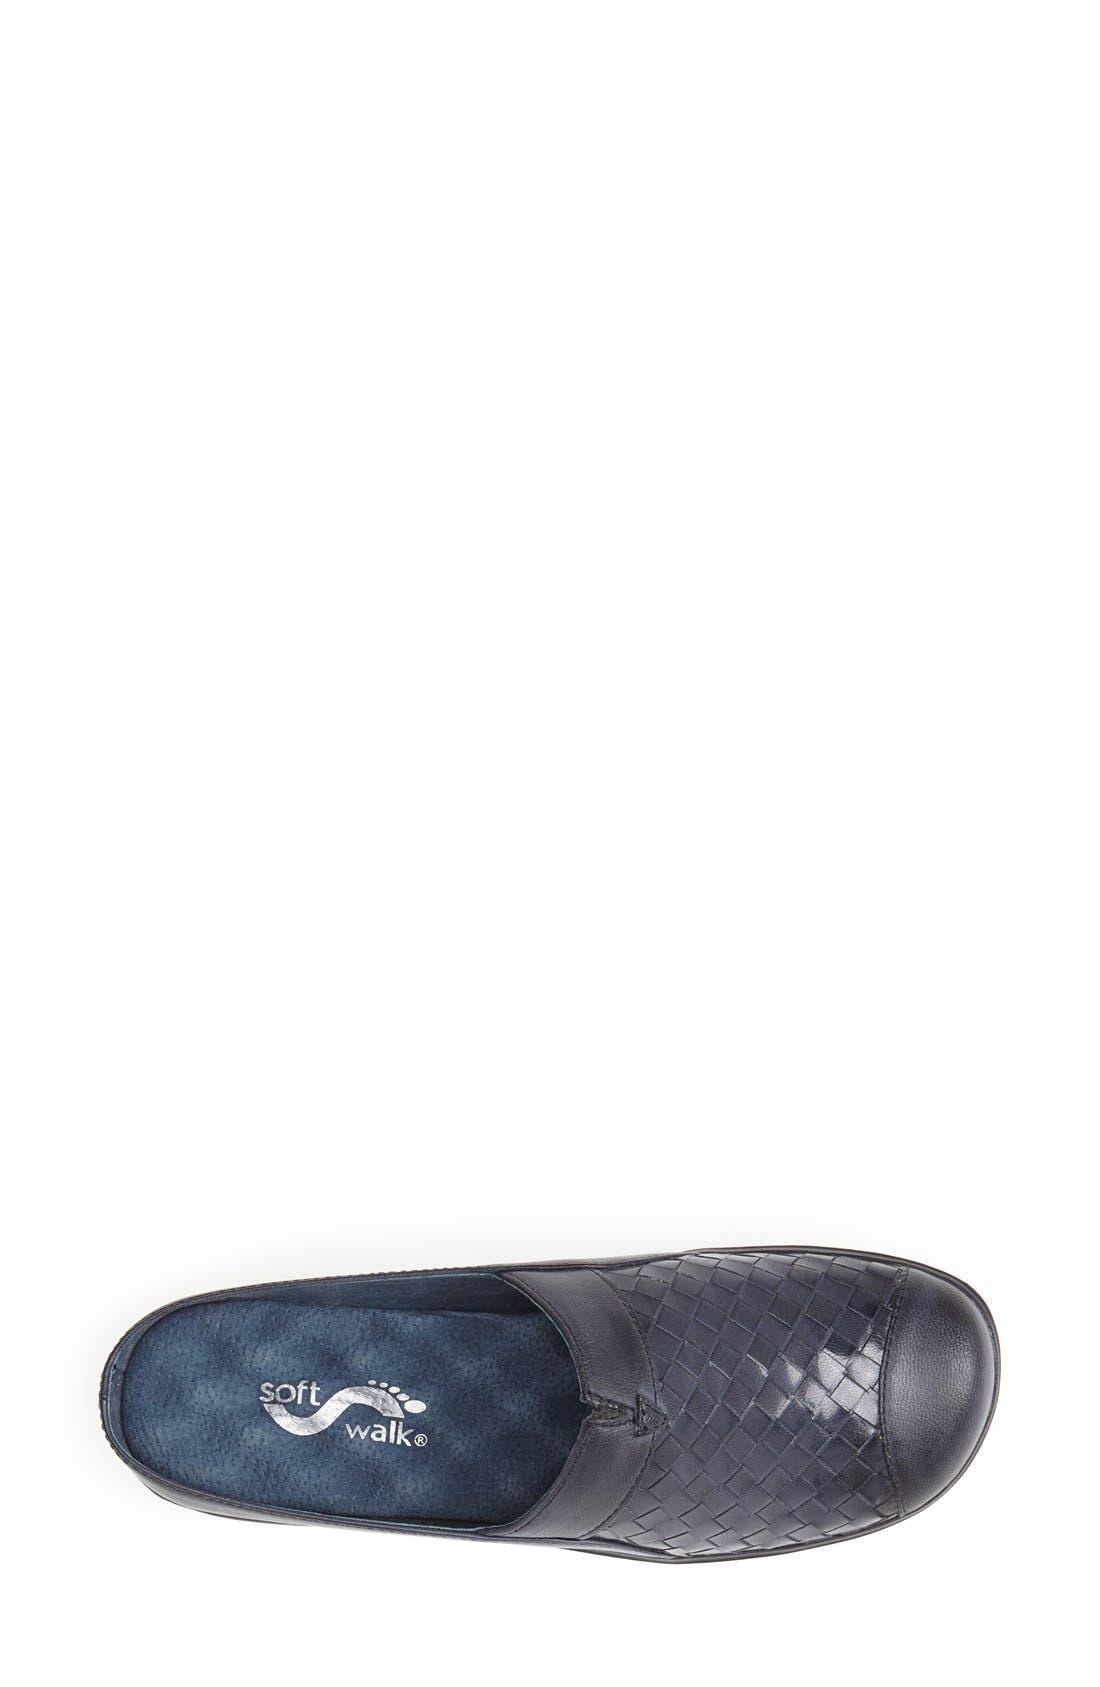 Alternate Image 3  - SoftWalk® 'San Marcos' Woven Clog (Women)